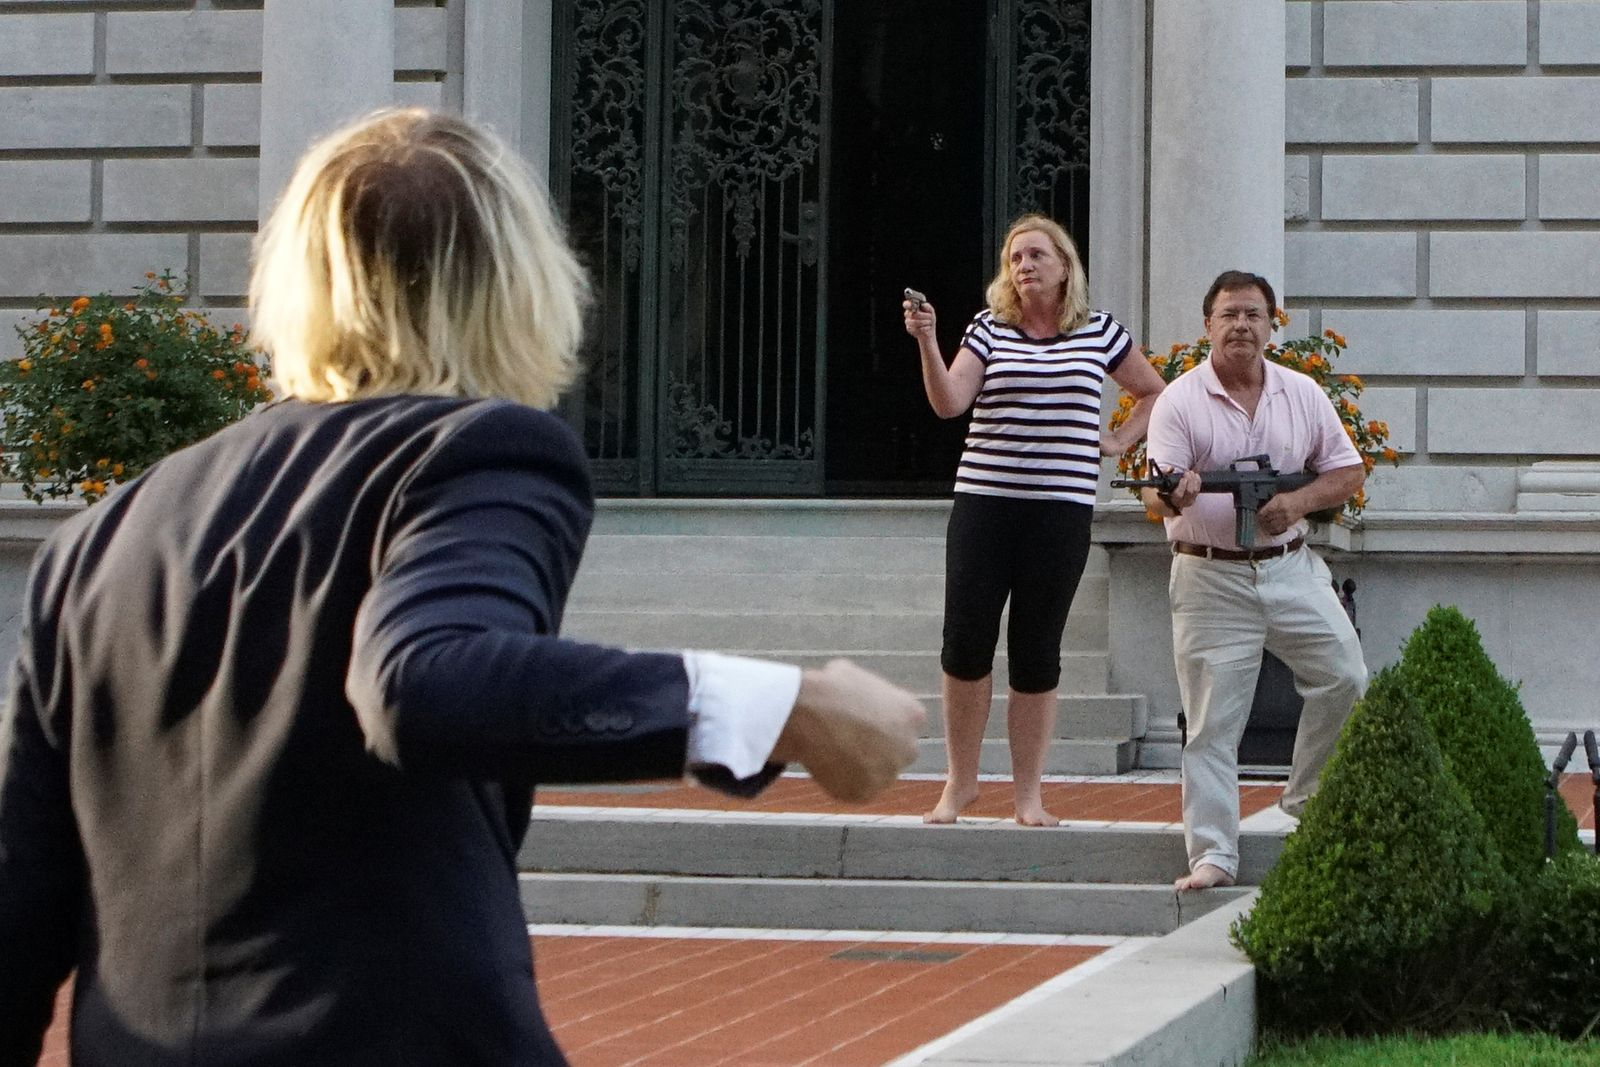 Protest against Mayor Lyda Krewson, in St. Louis, Missouri